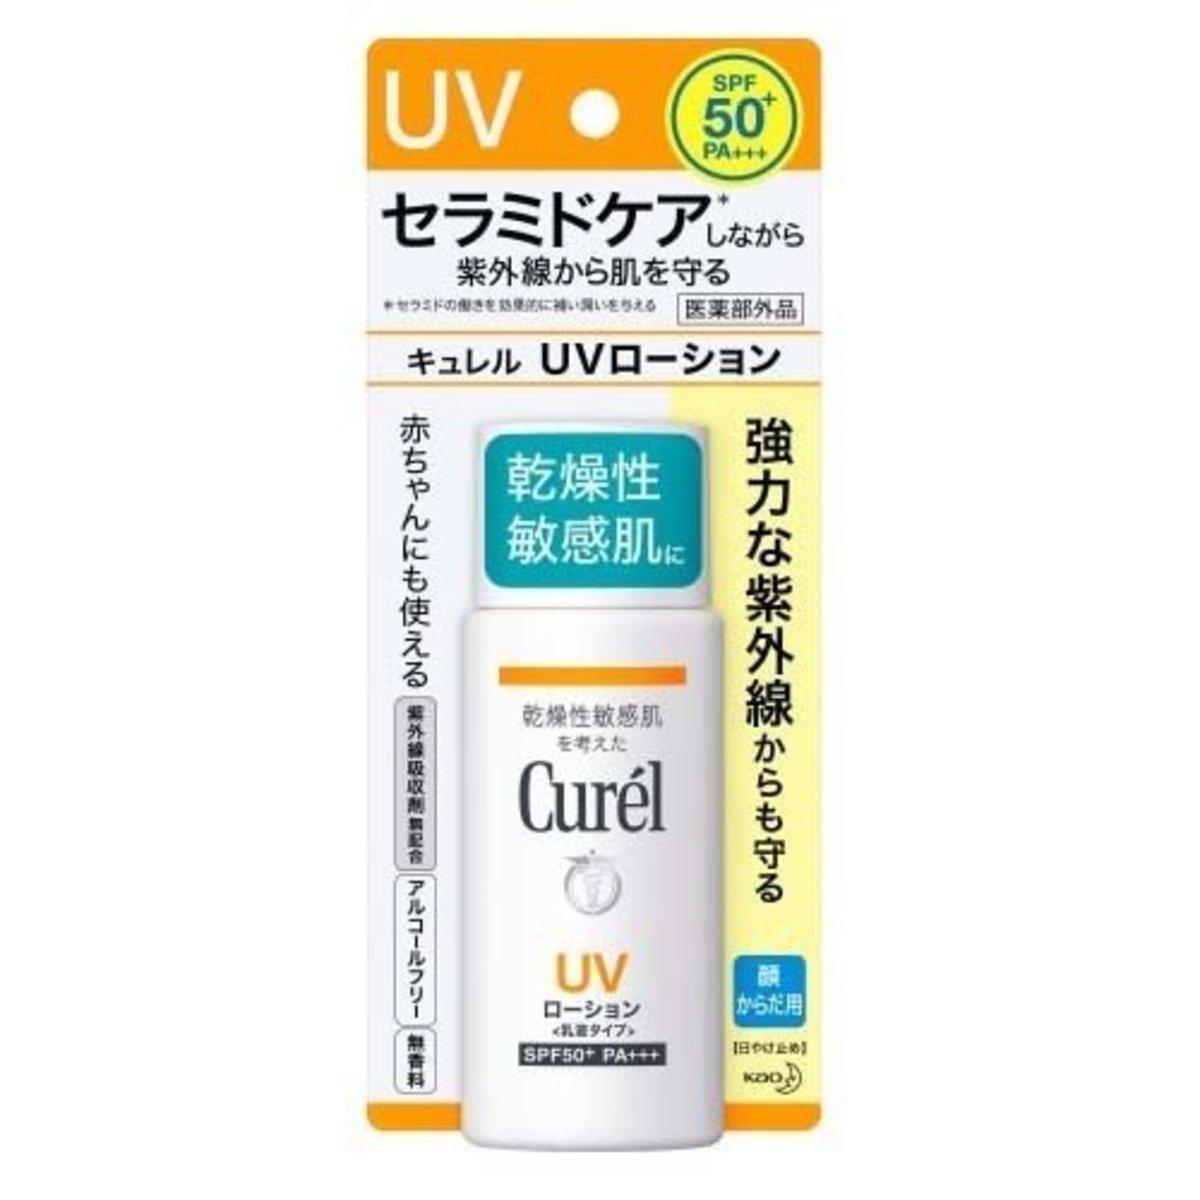 Curel UV Lotion SPF50+ PA+++ 60ml